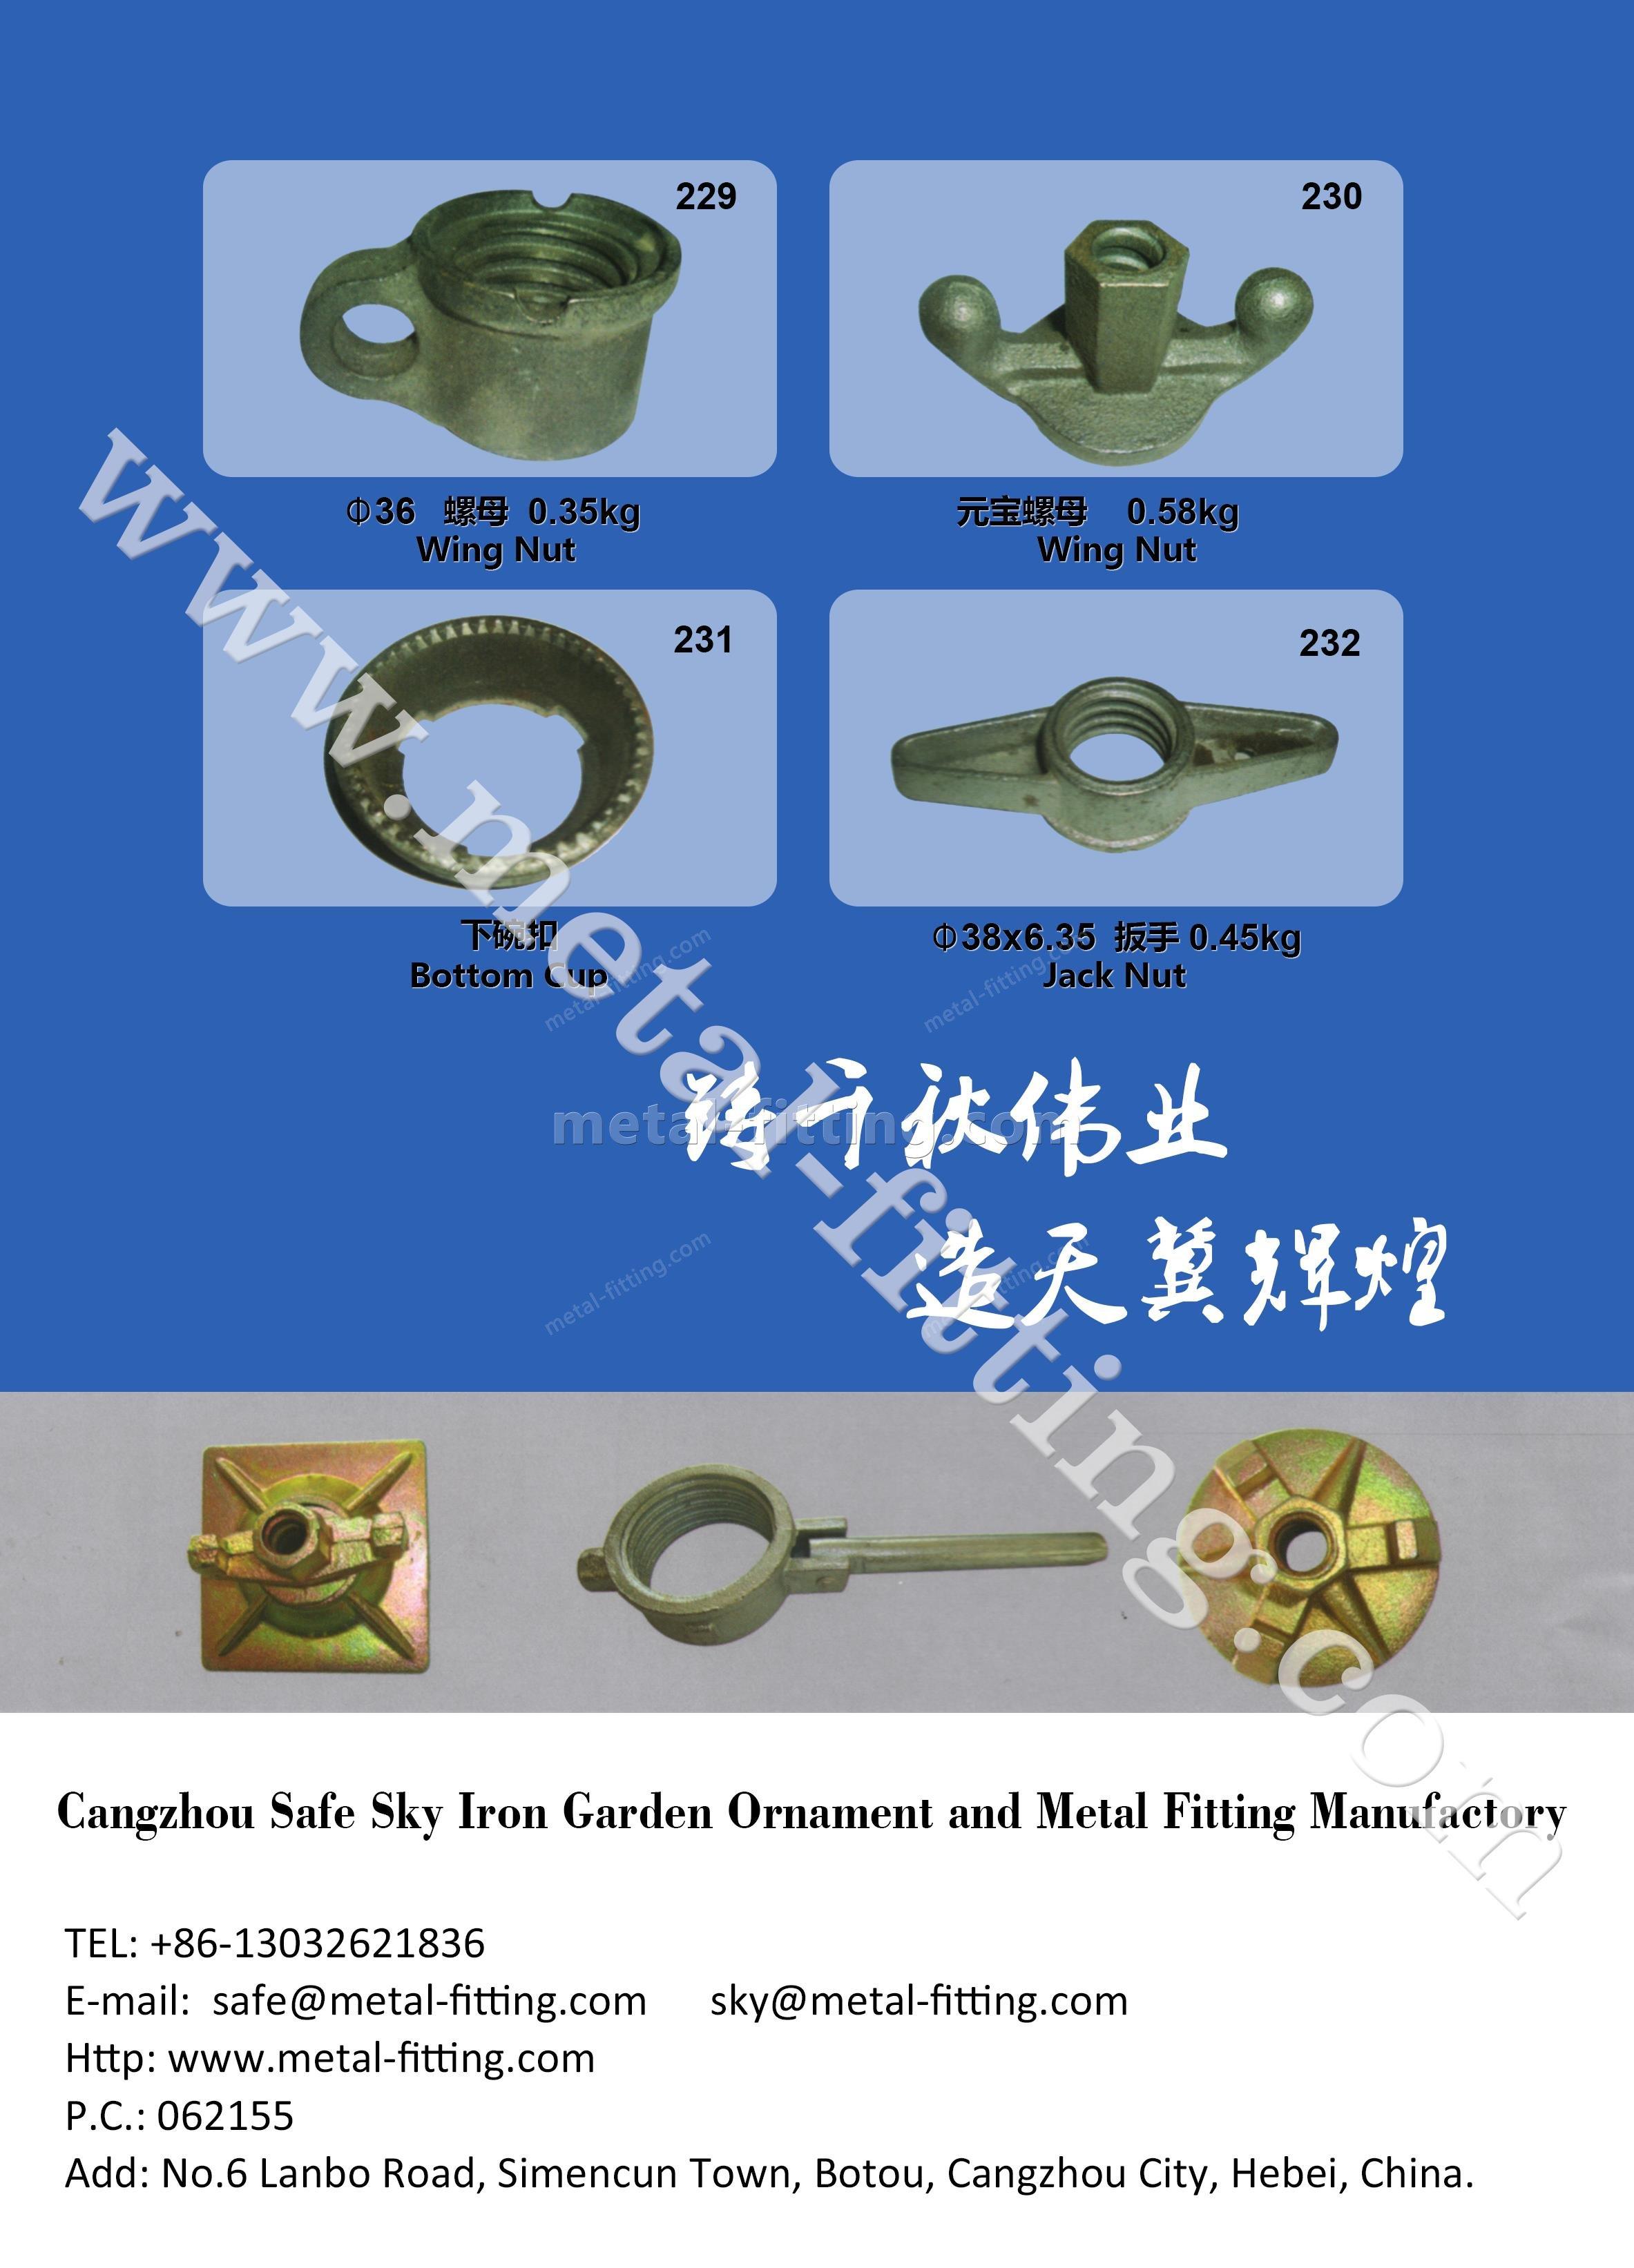 casting steel metal fitting, scaffolding system-封底